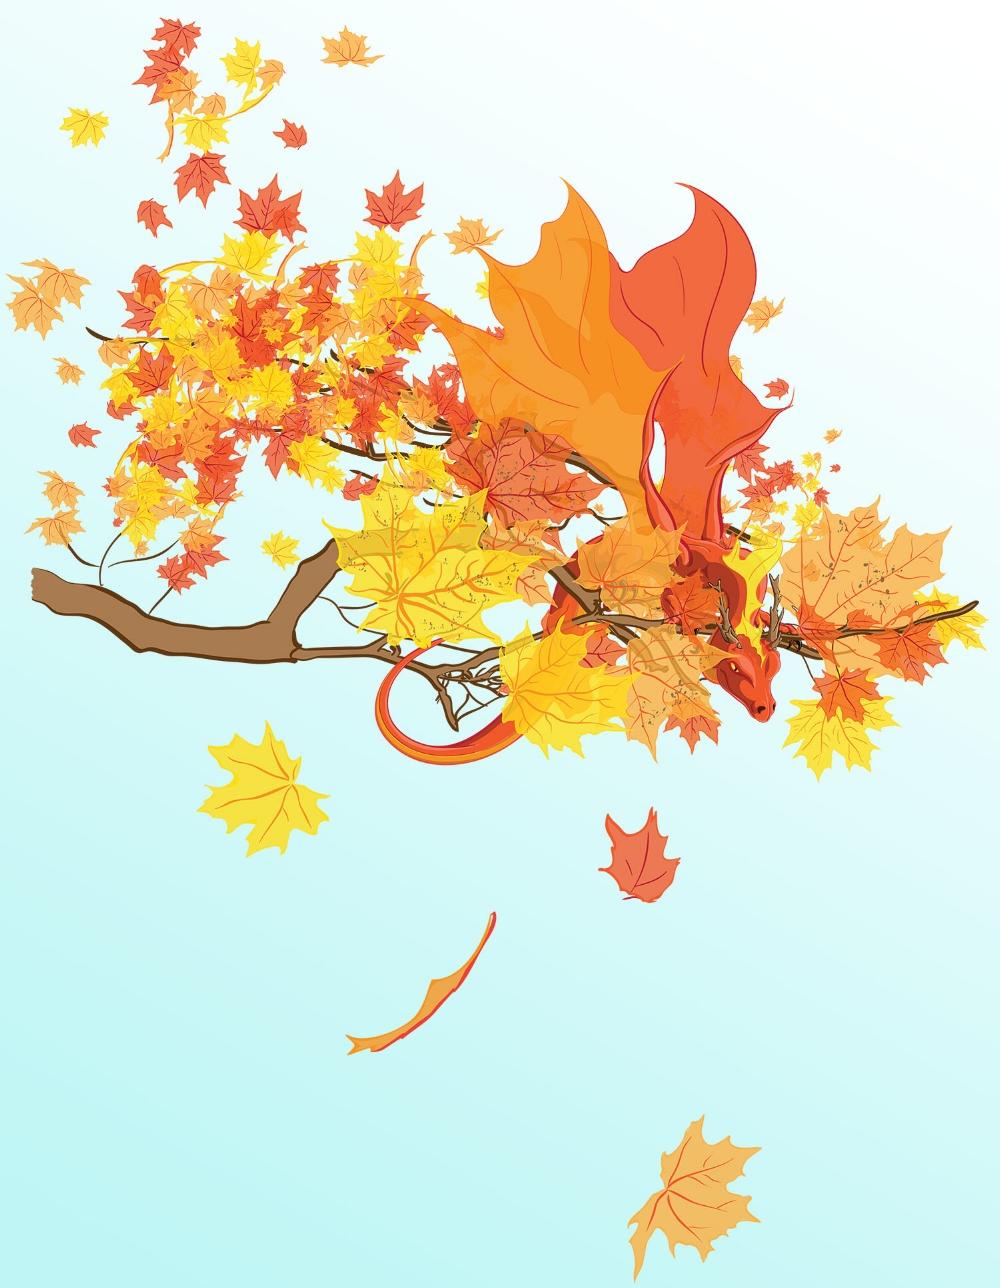 Autumn-Dragon-web2.jpg